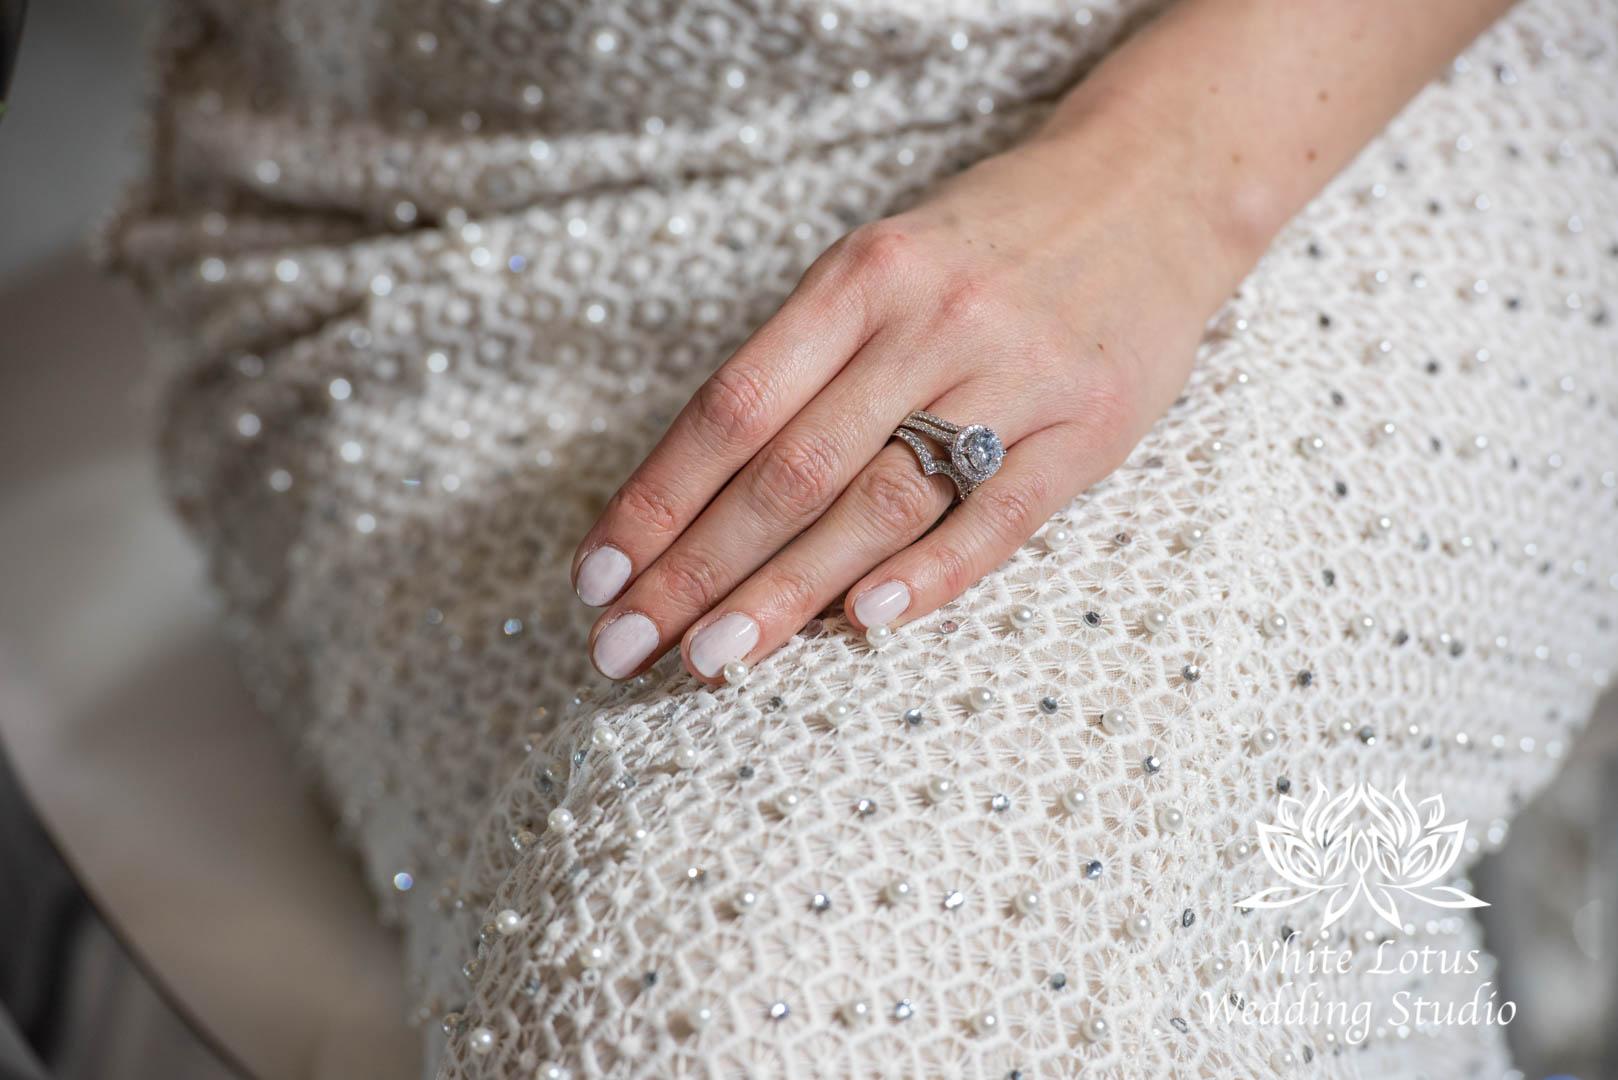 150- GLAM WINTERLUXE WEDDING INSPIRATION